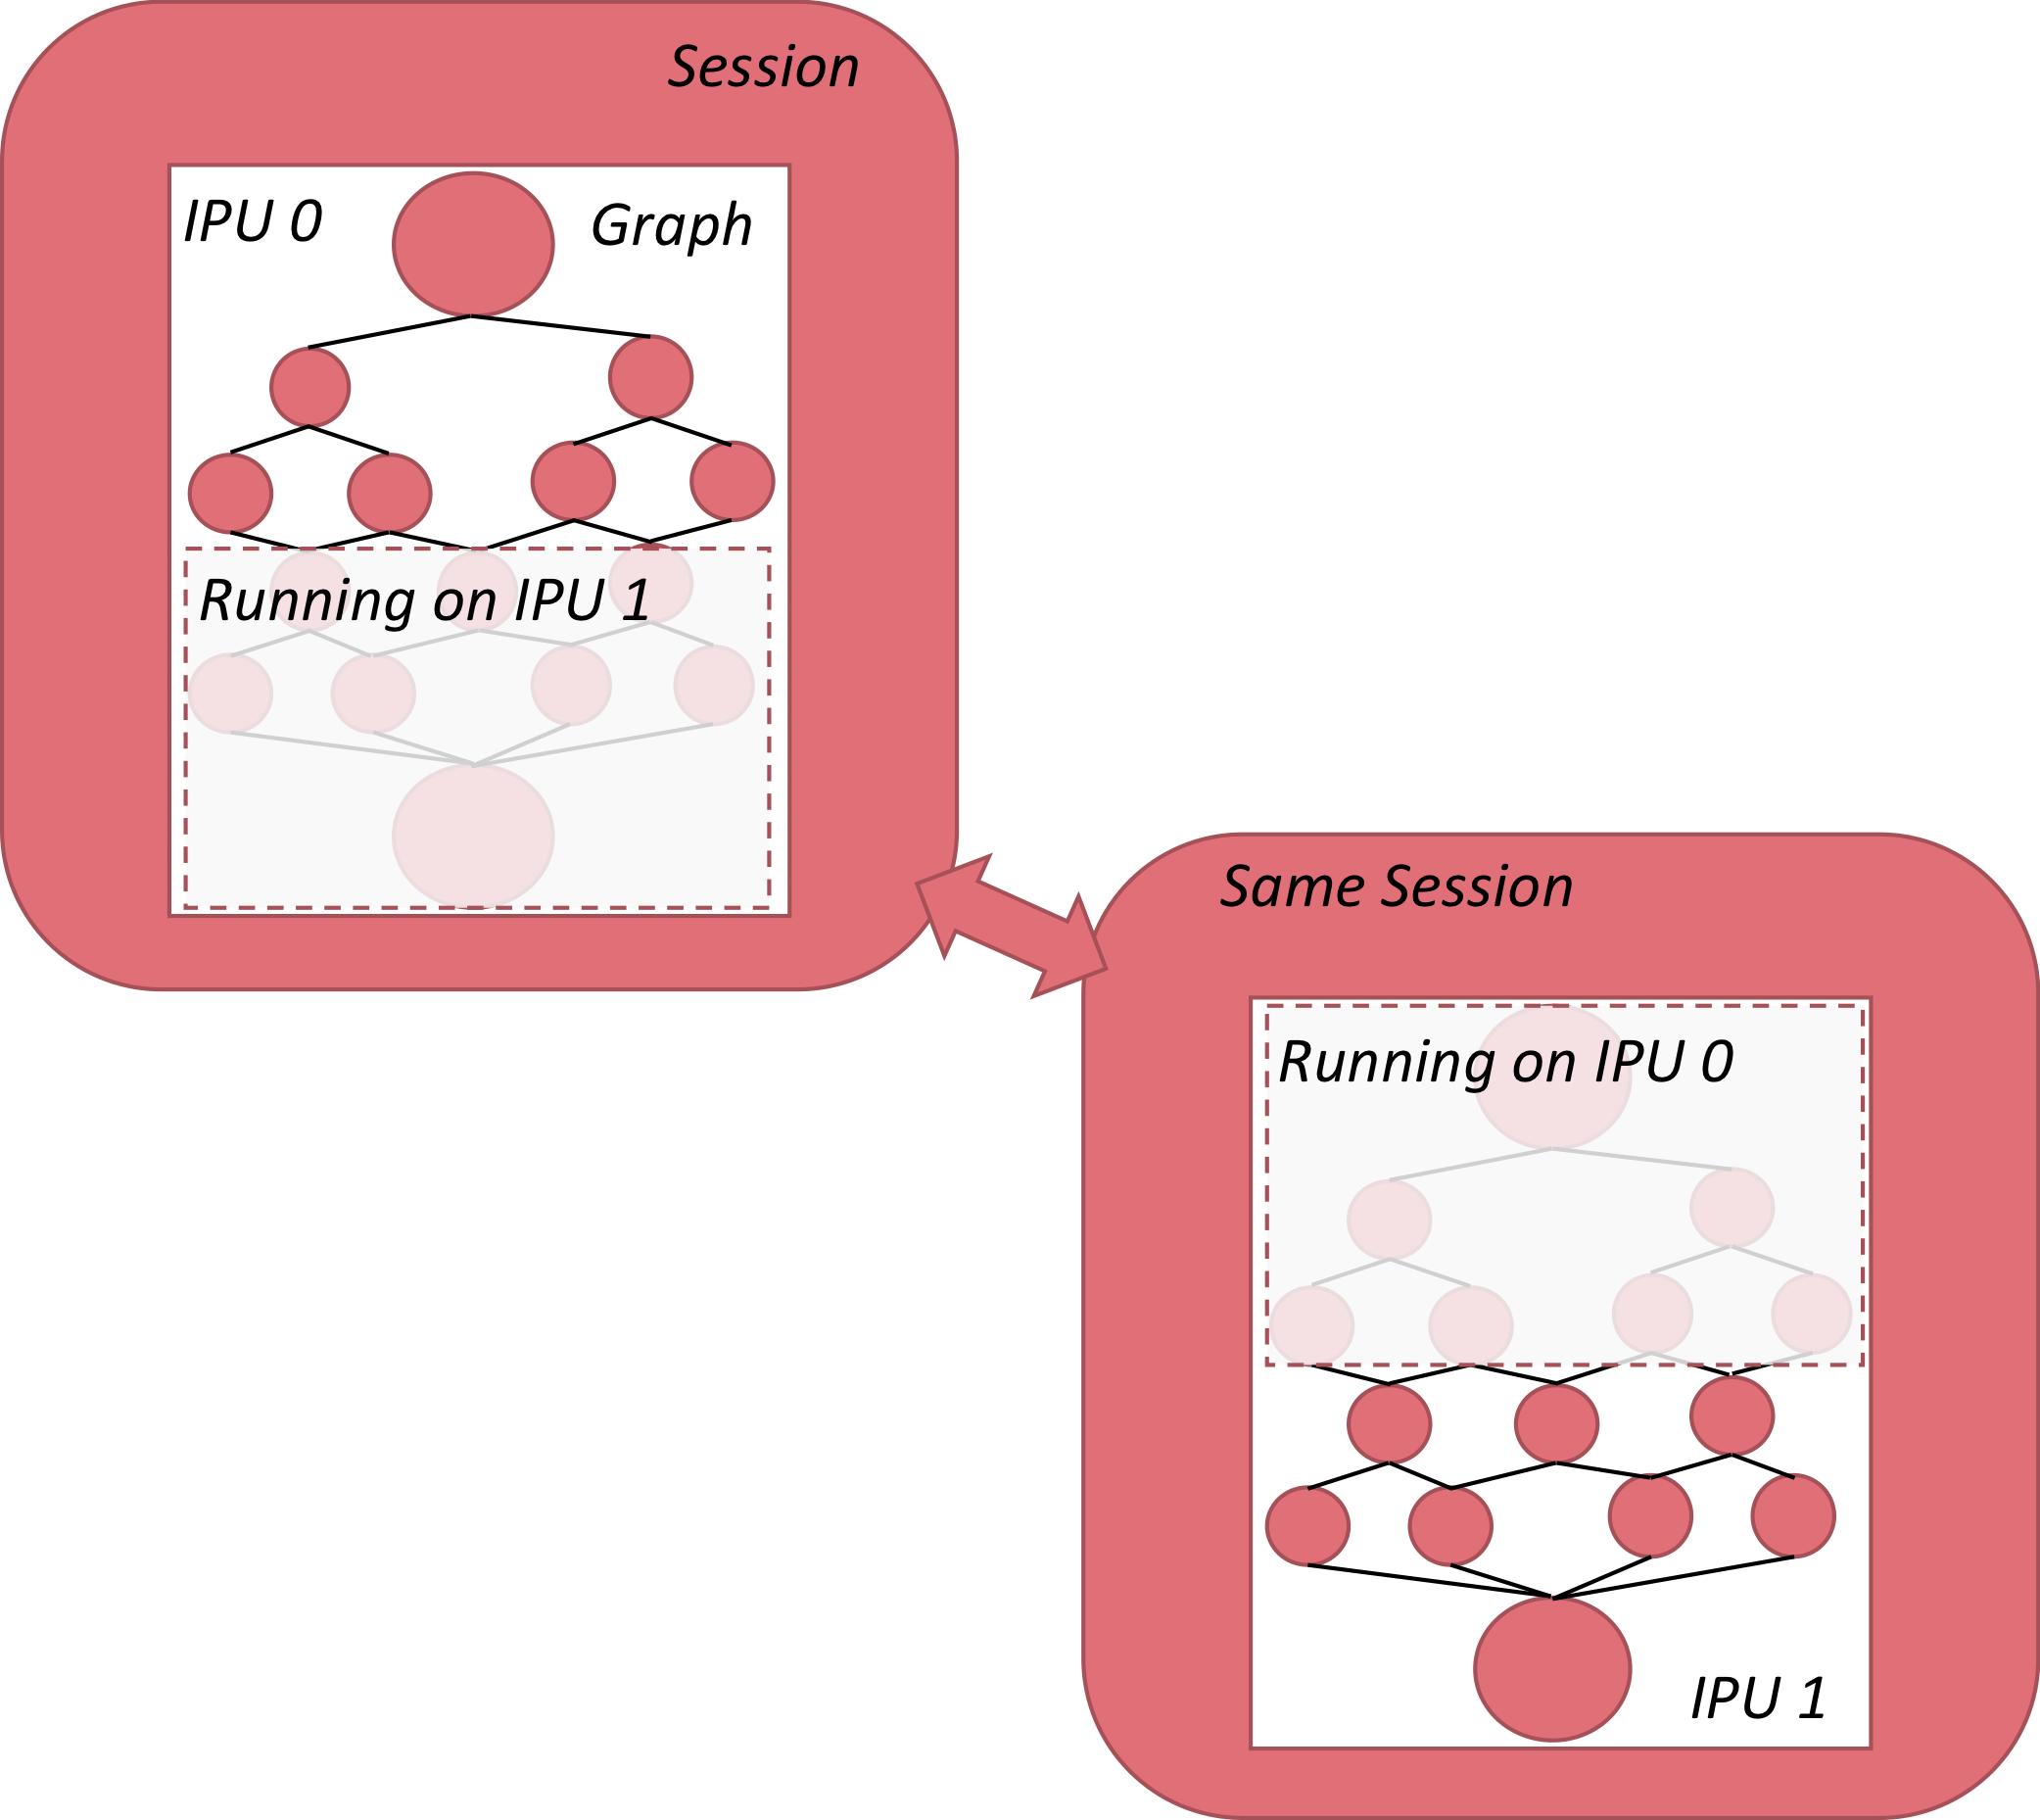 Sharding across two IPUs